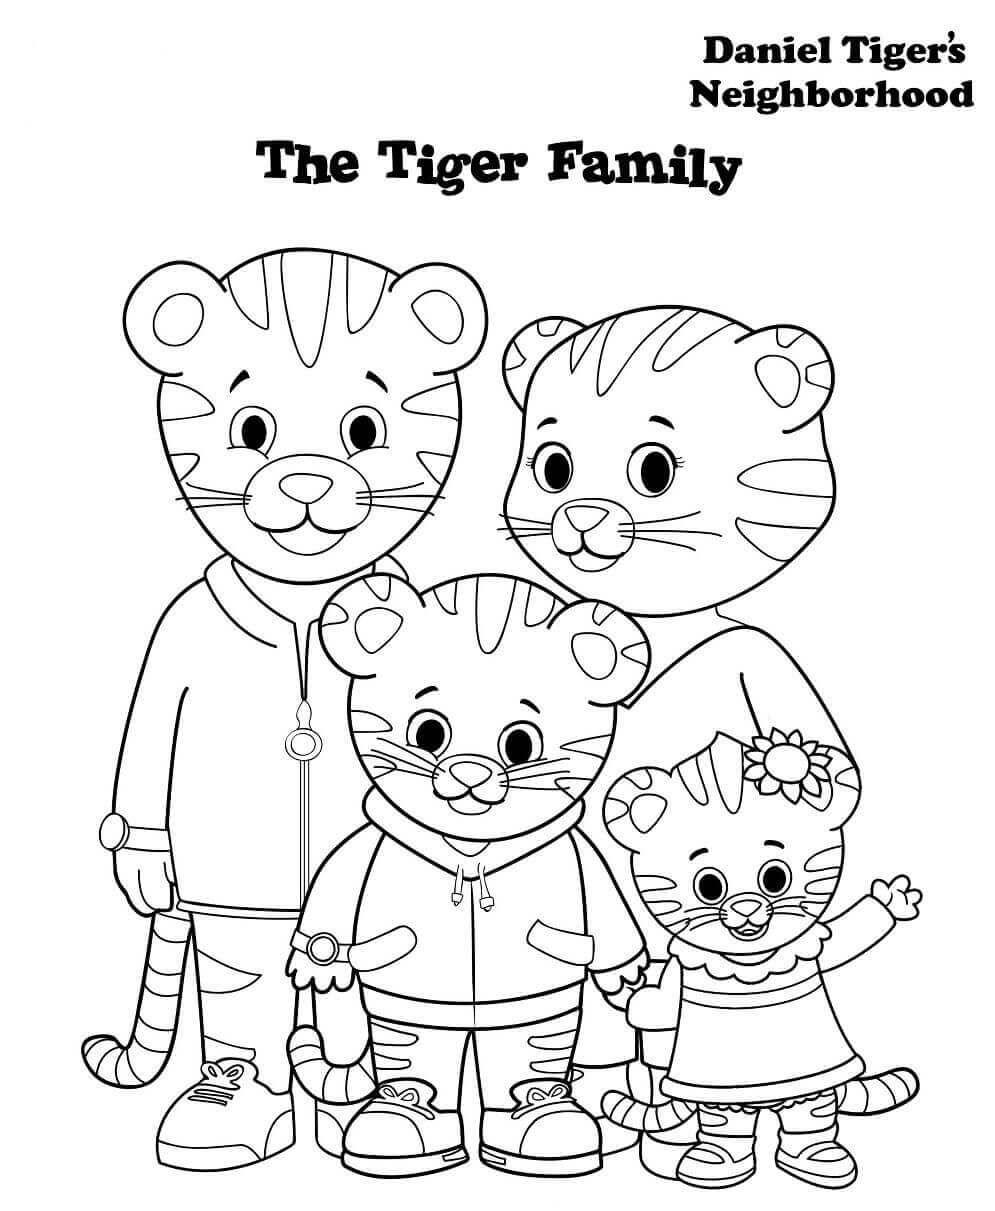 Daniel Tiger Family Coloring Pages Daniel Tiger S Neighborhood Daniel Tiger Family Coloring Pages